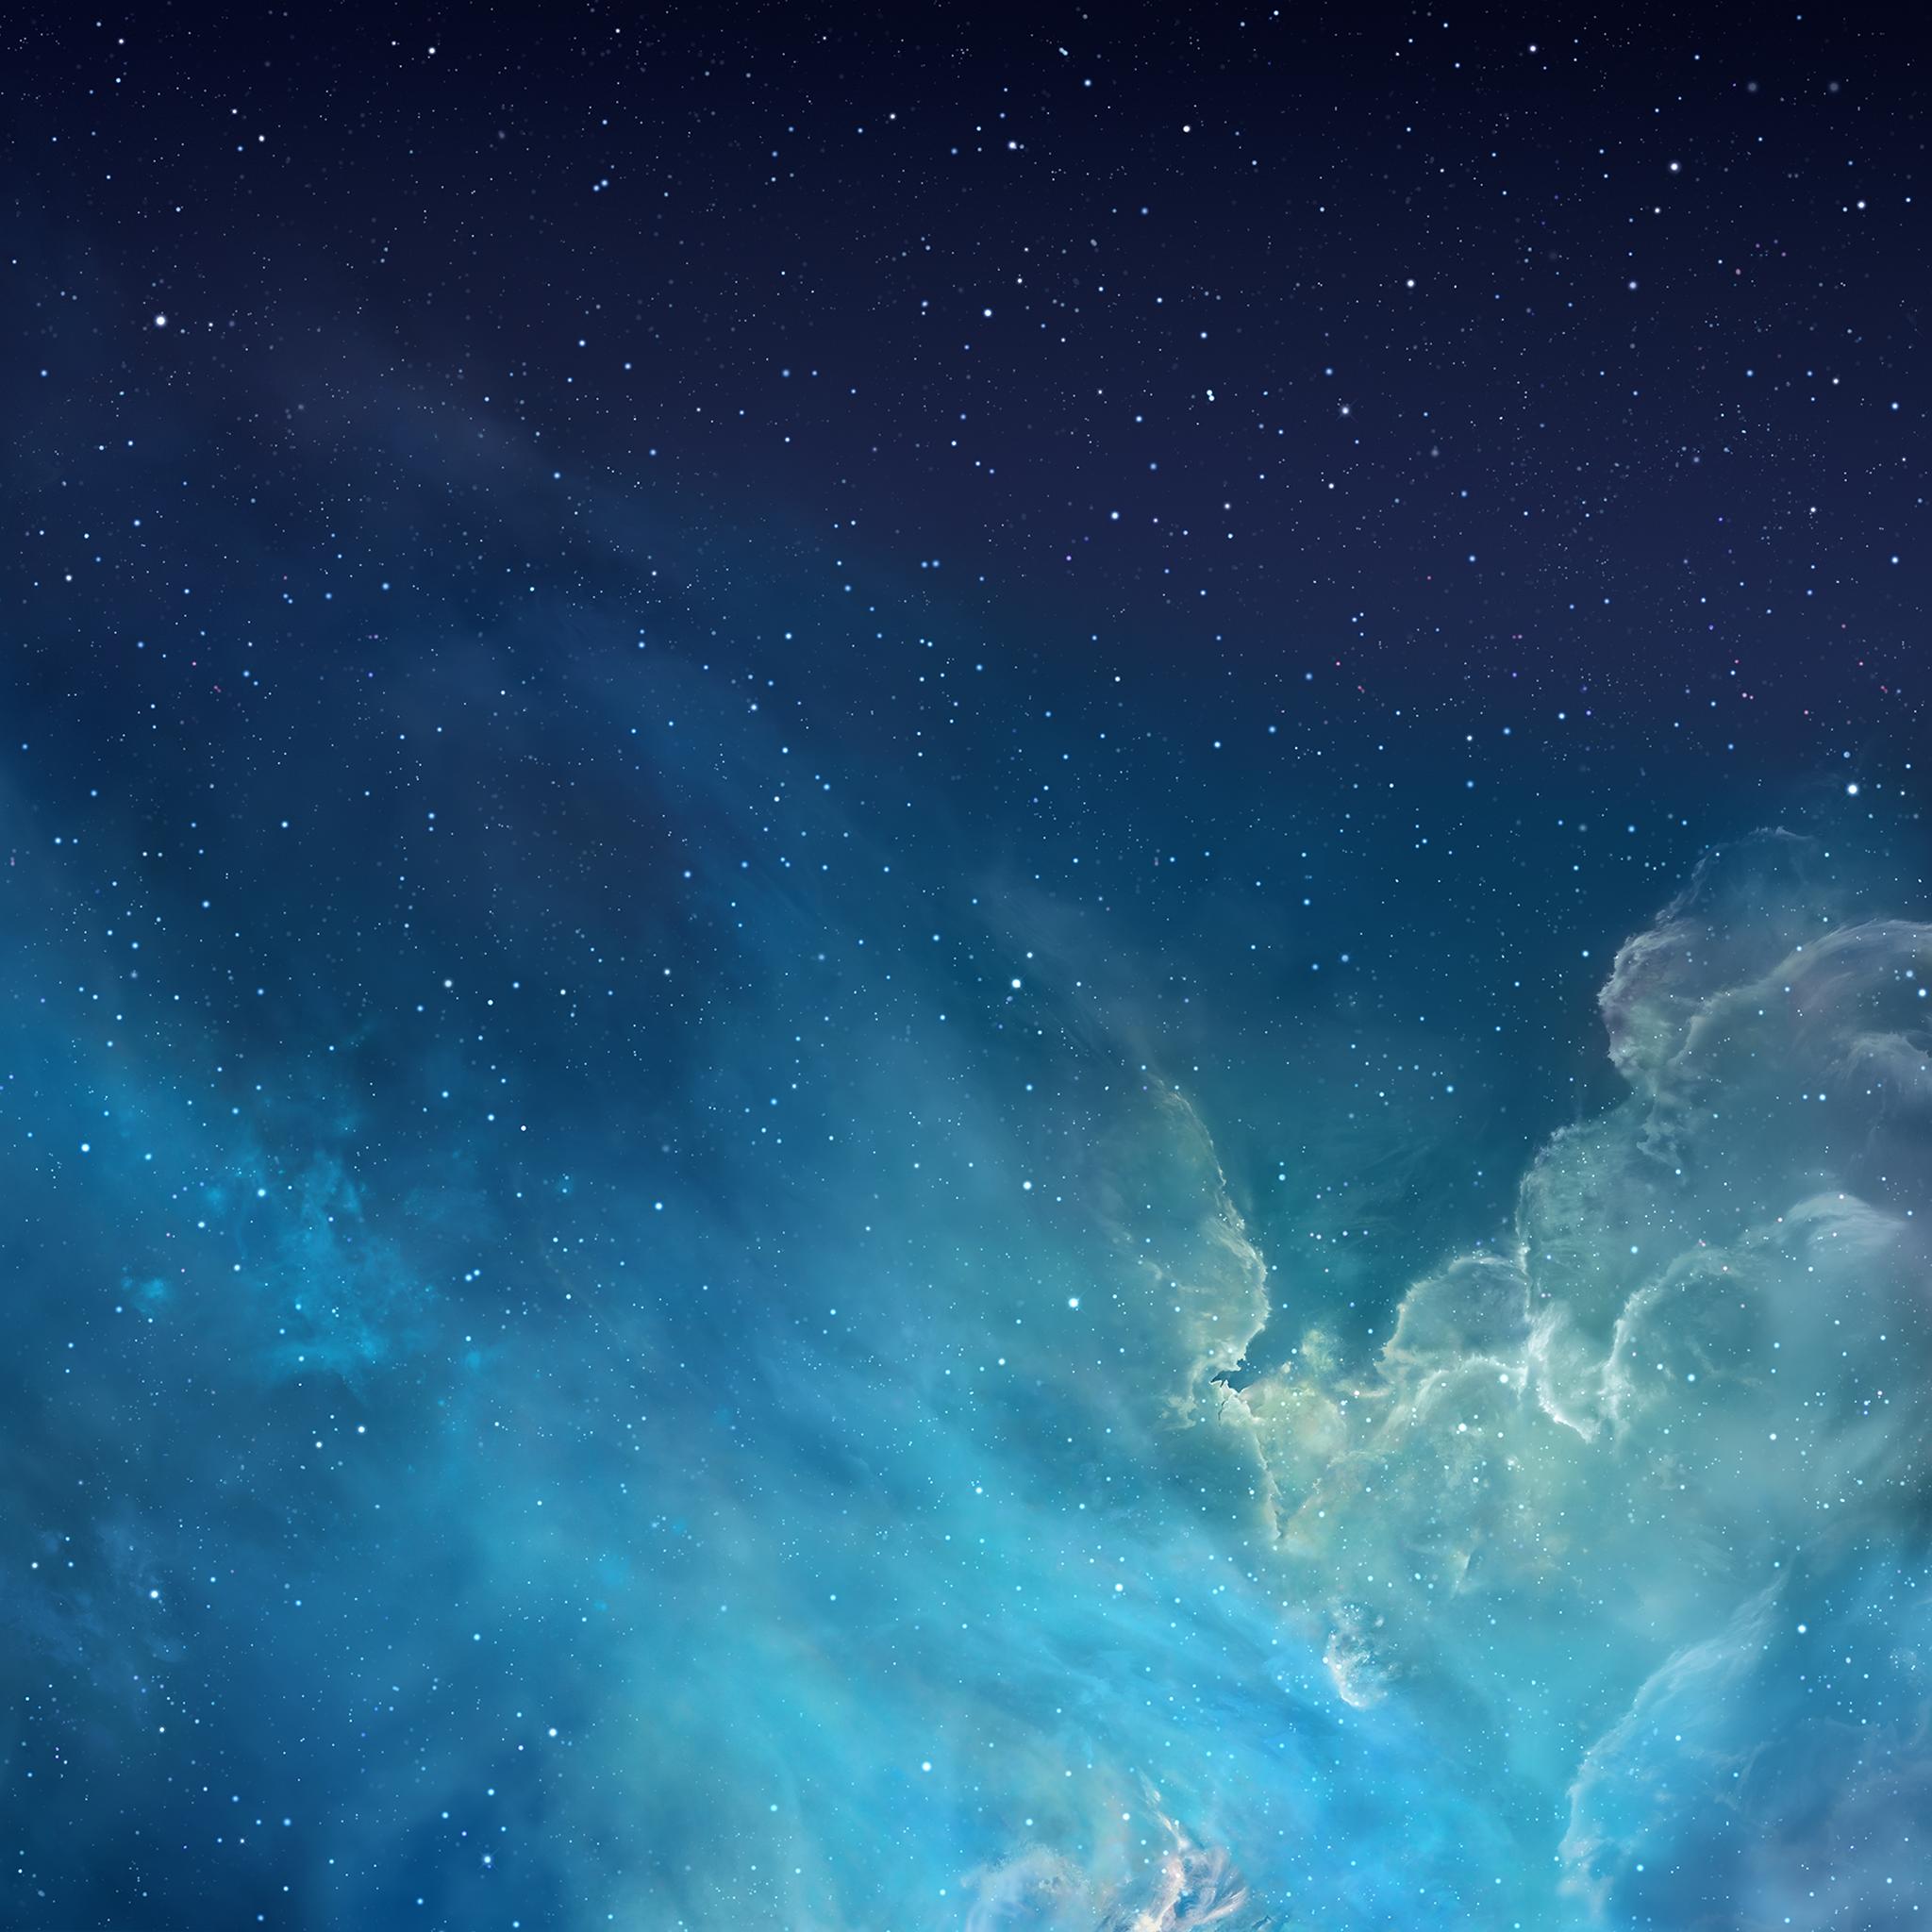 General 2048x2048 galaxy space sky iOS 7 stars nebula space art blue